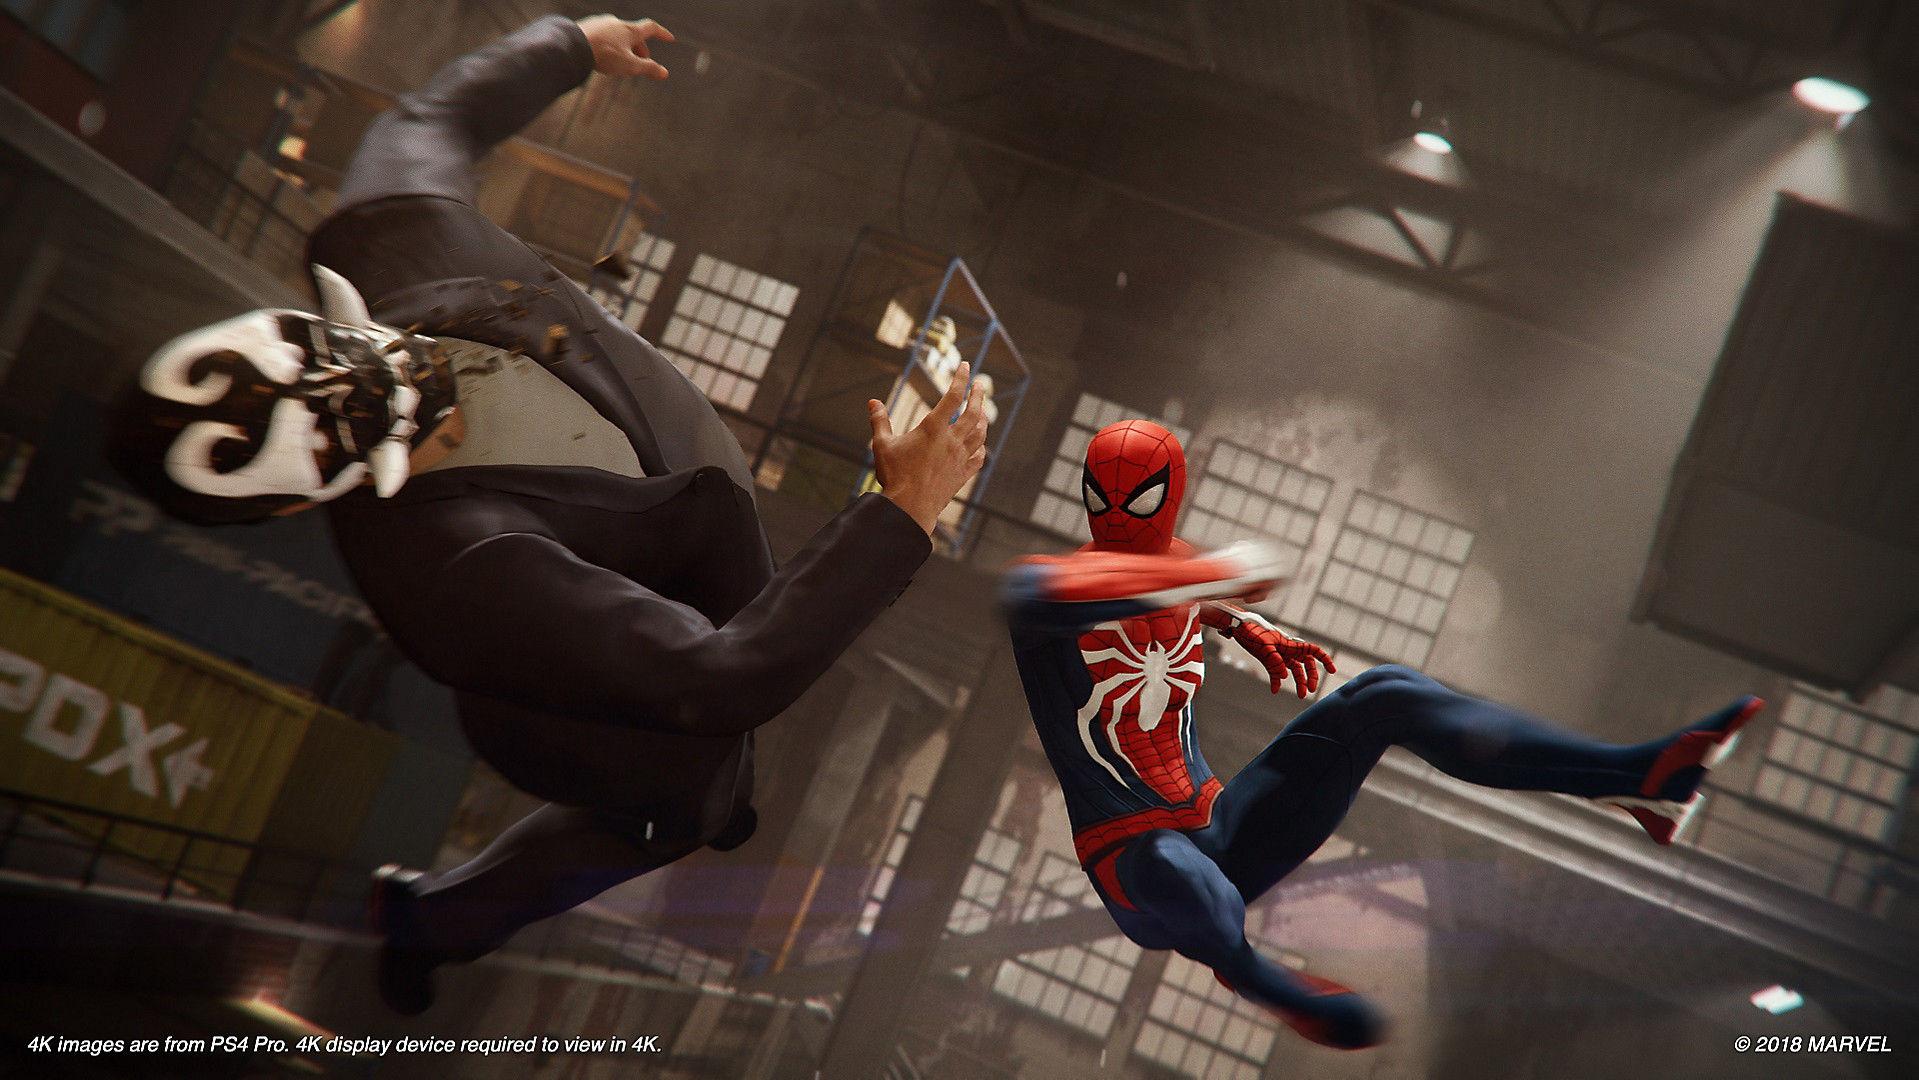 Marvel's Spiderman 2018 storyline